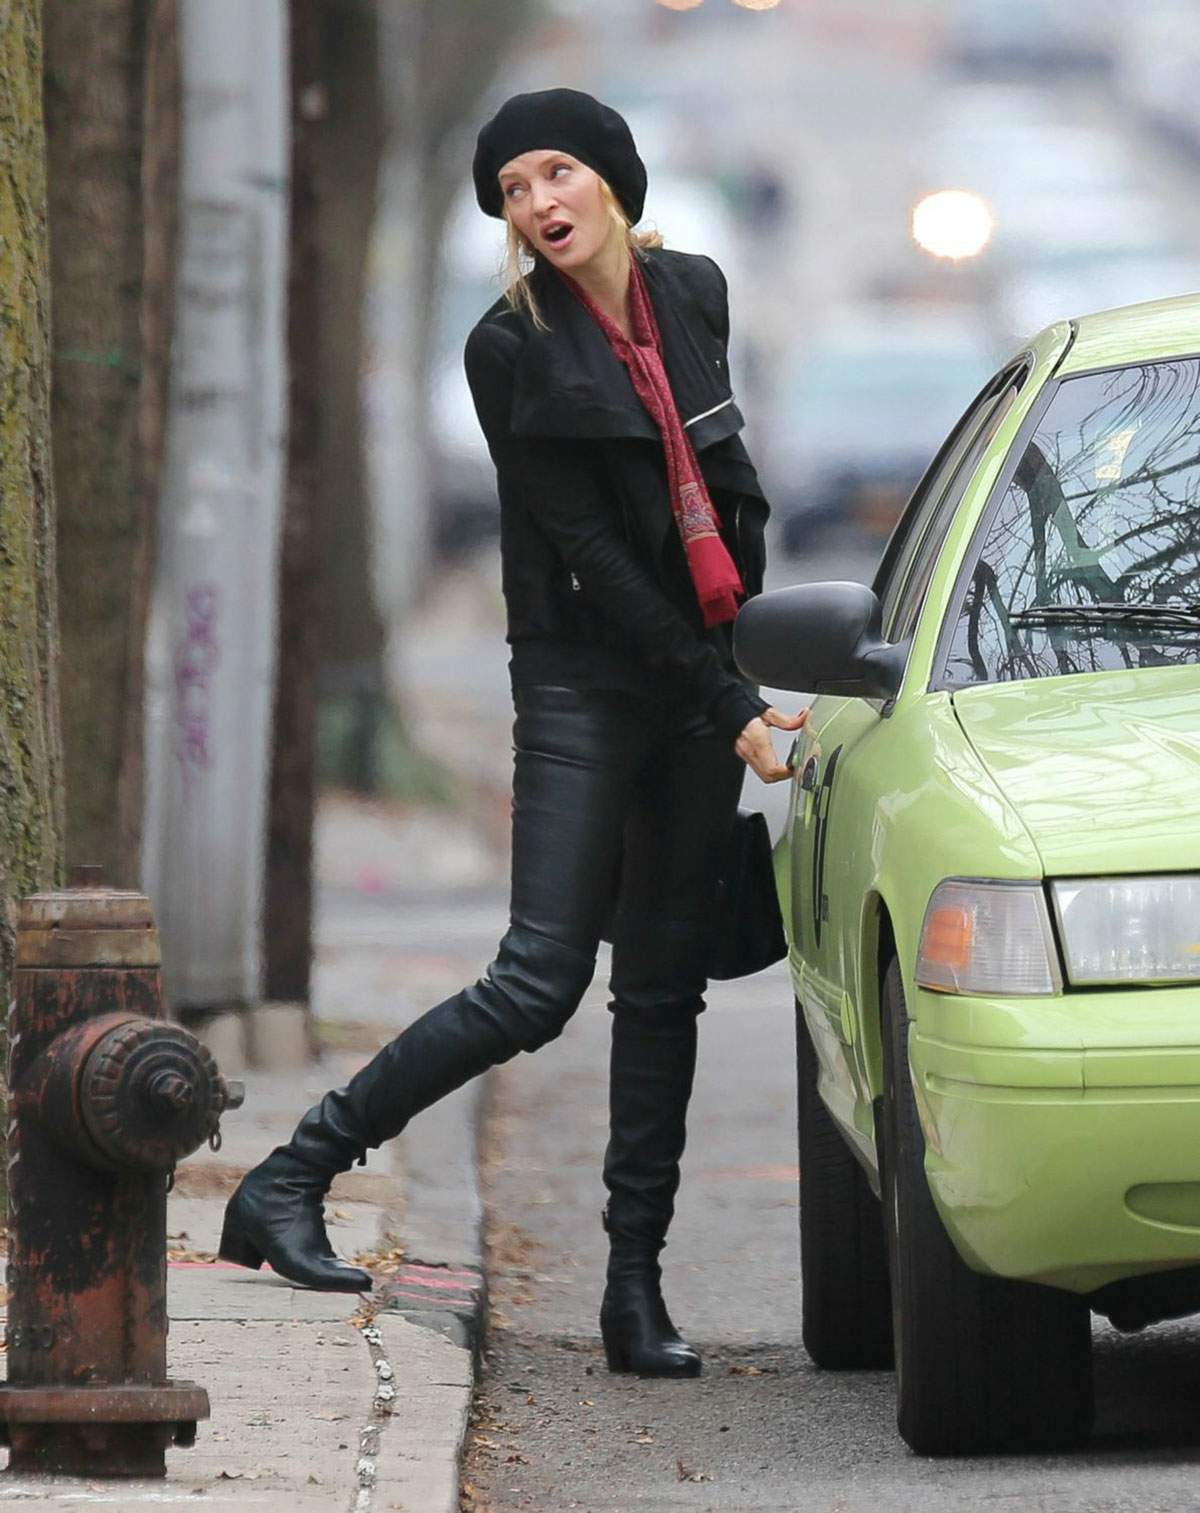 Uma Thurman shooting scenes for upcoming NBC miniseries The Slap